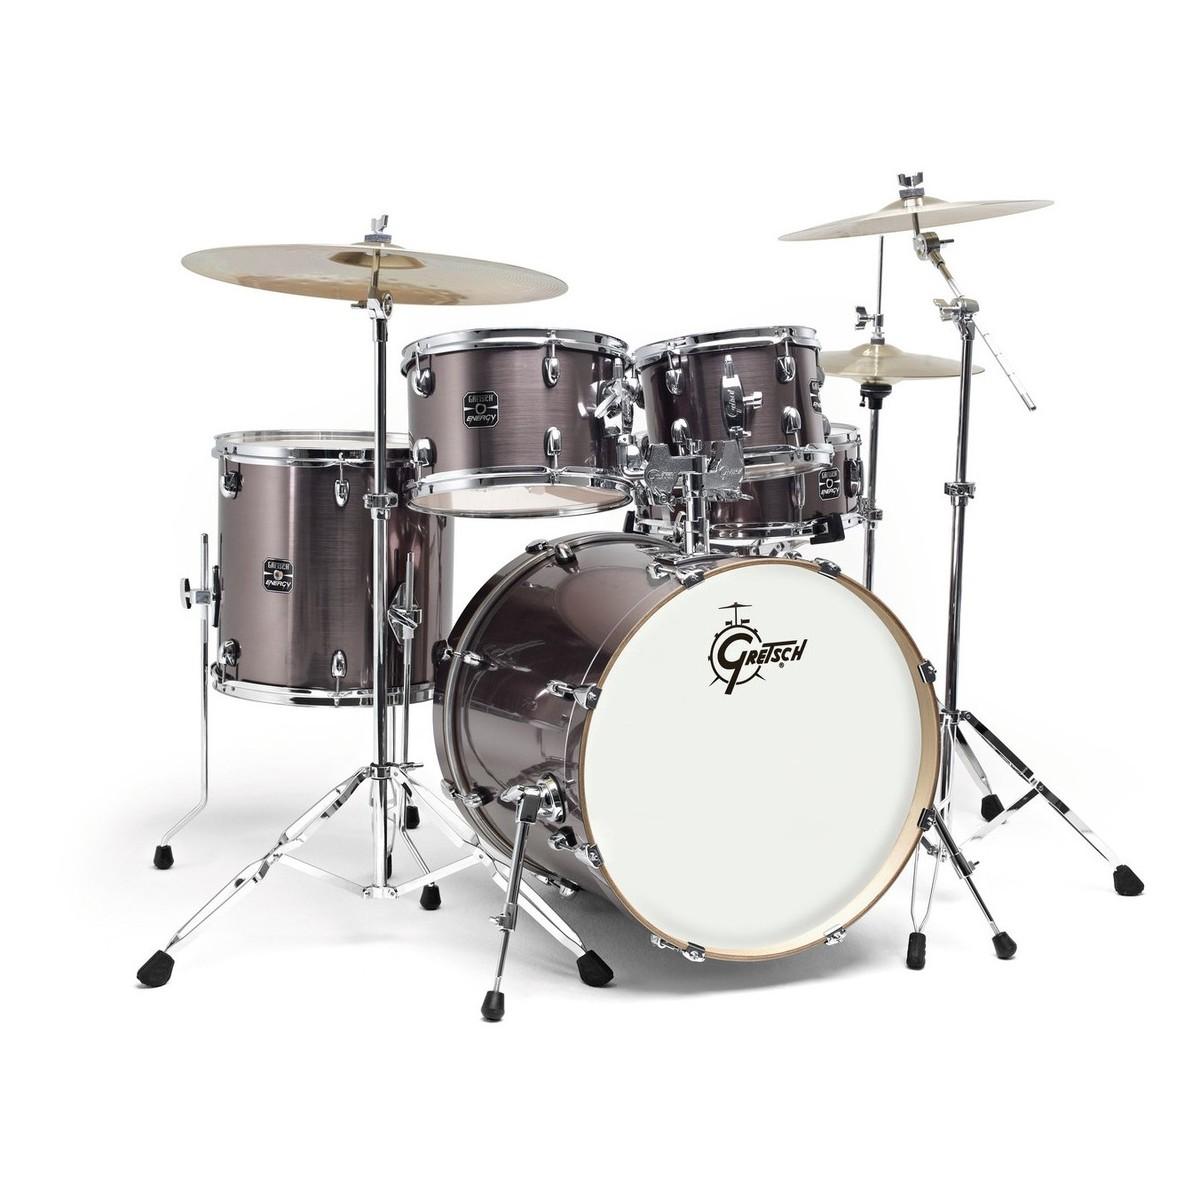 gretsch energy 20 drum kit w hardware paiste 101 set grey steel at gear4music. Black Bedroom Furniture Sets. Home Design Ideas